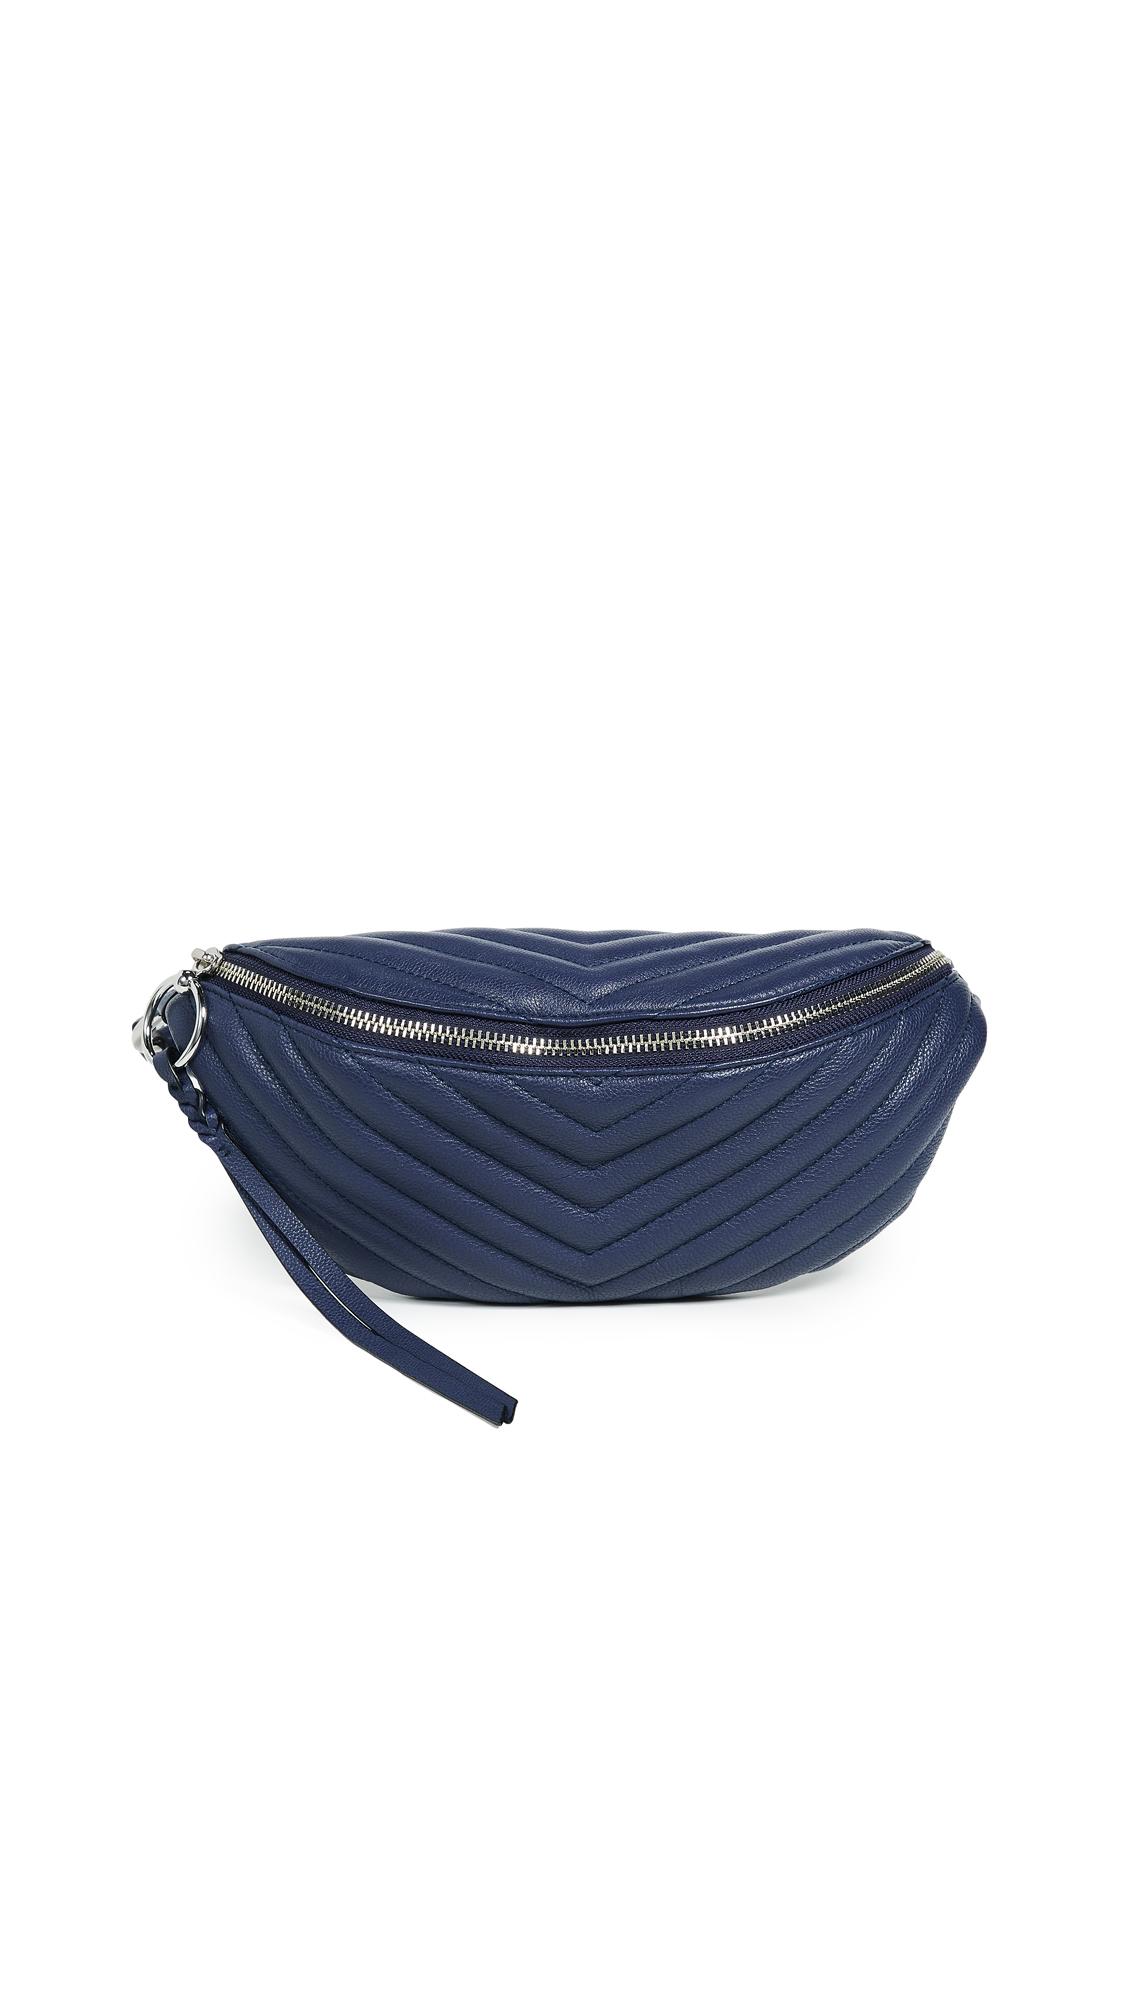 Rebecca Minkoff Edie Sling Bag